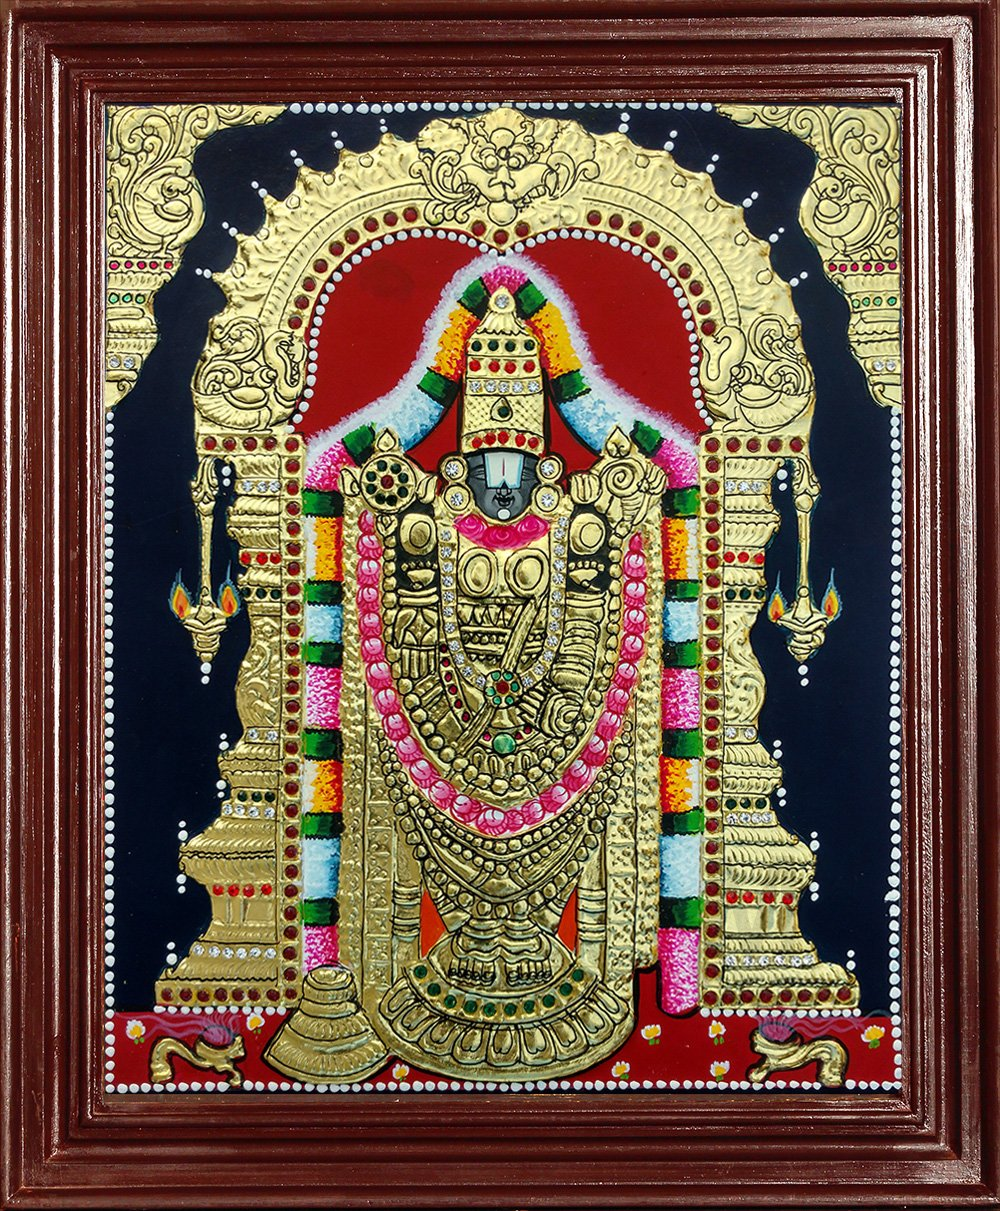 Tirupathi Balaji Tanjore Painting - 22 Carat Gold Foil